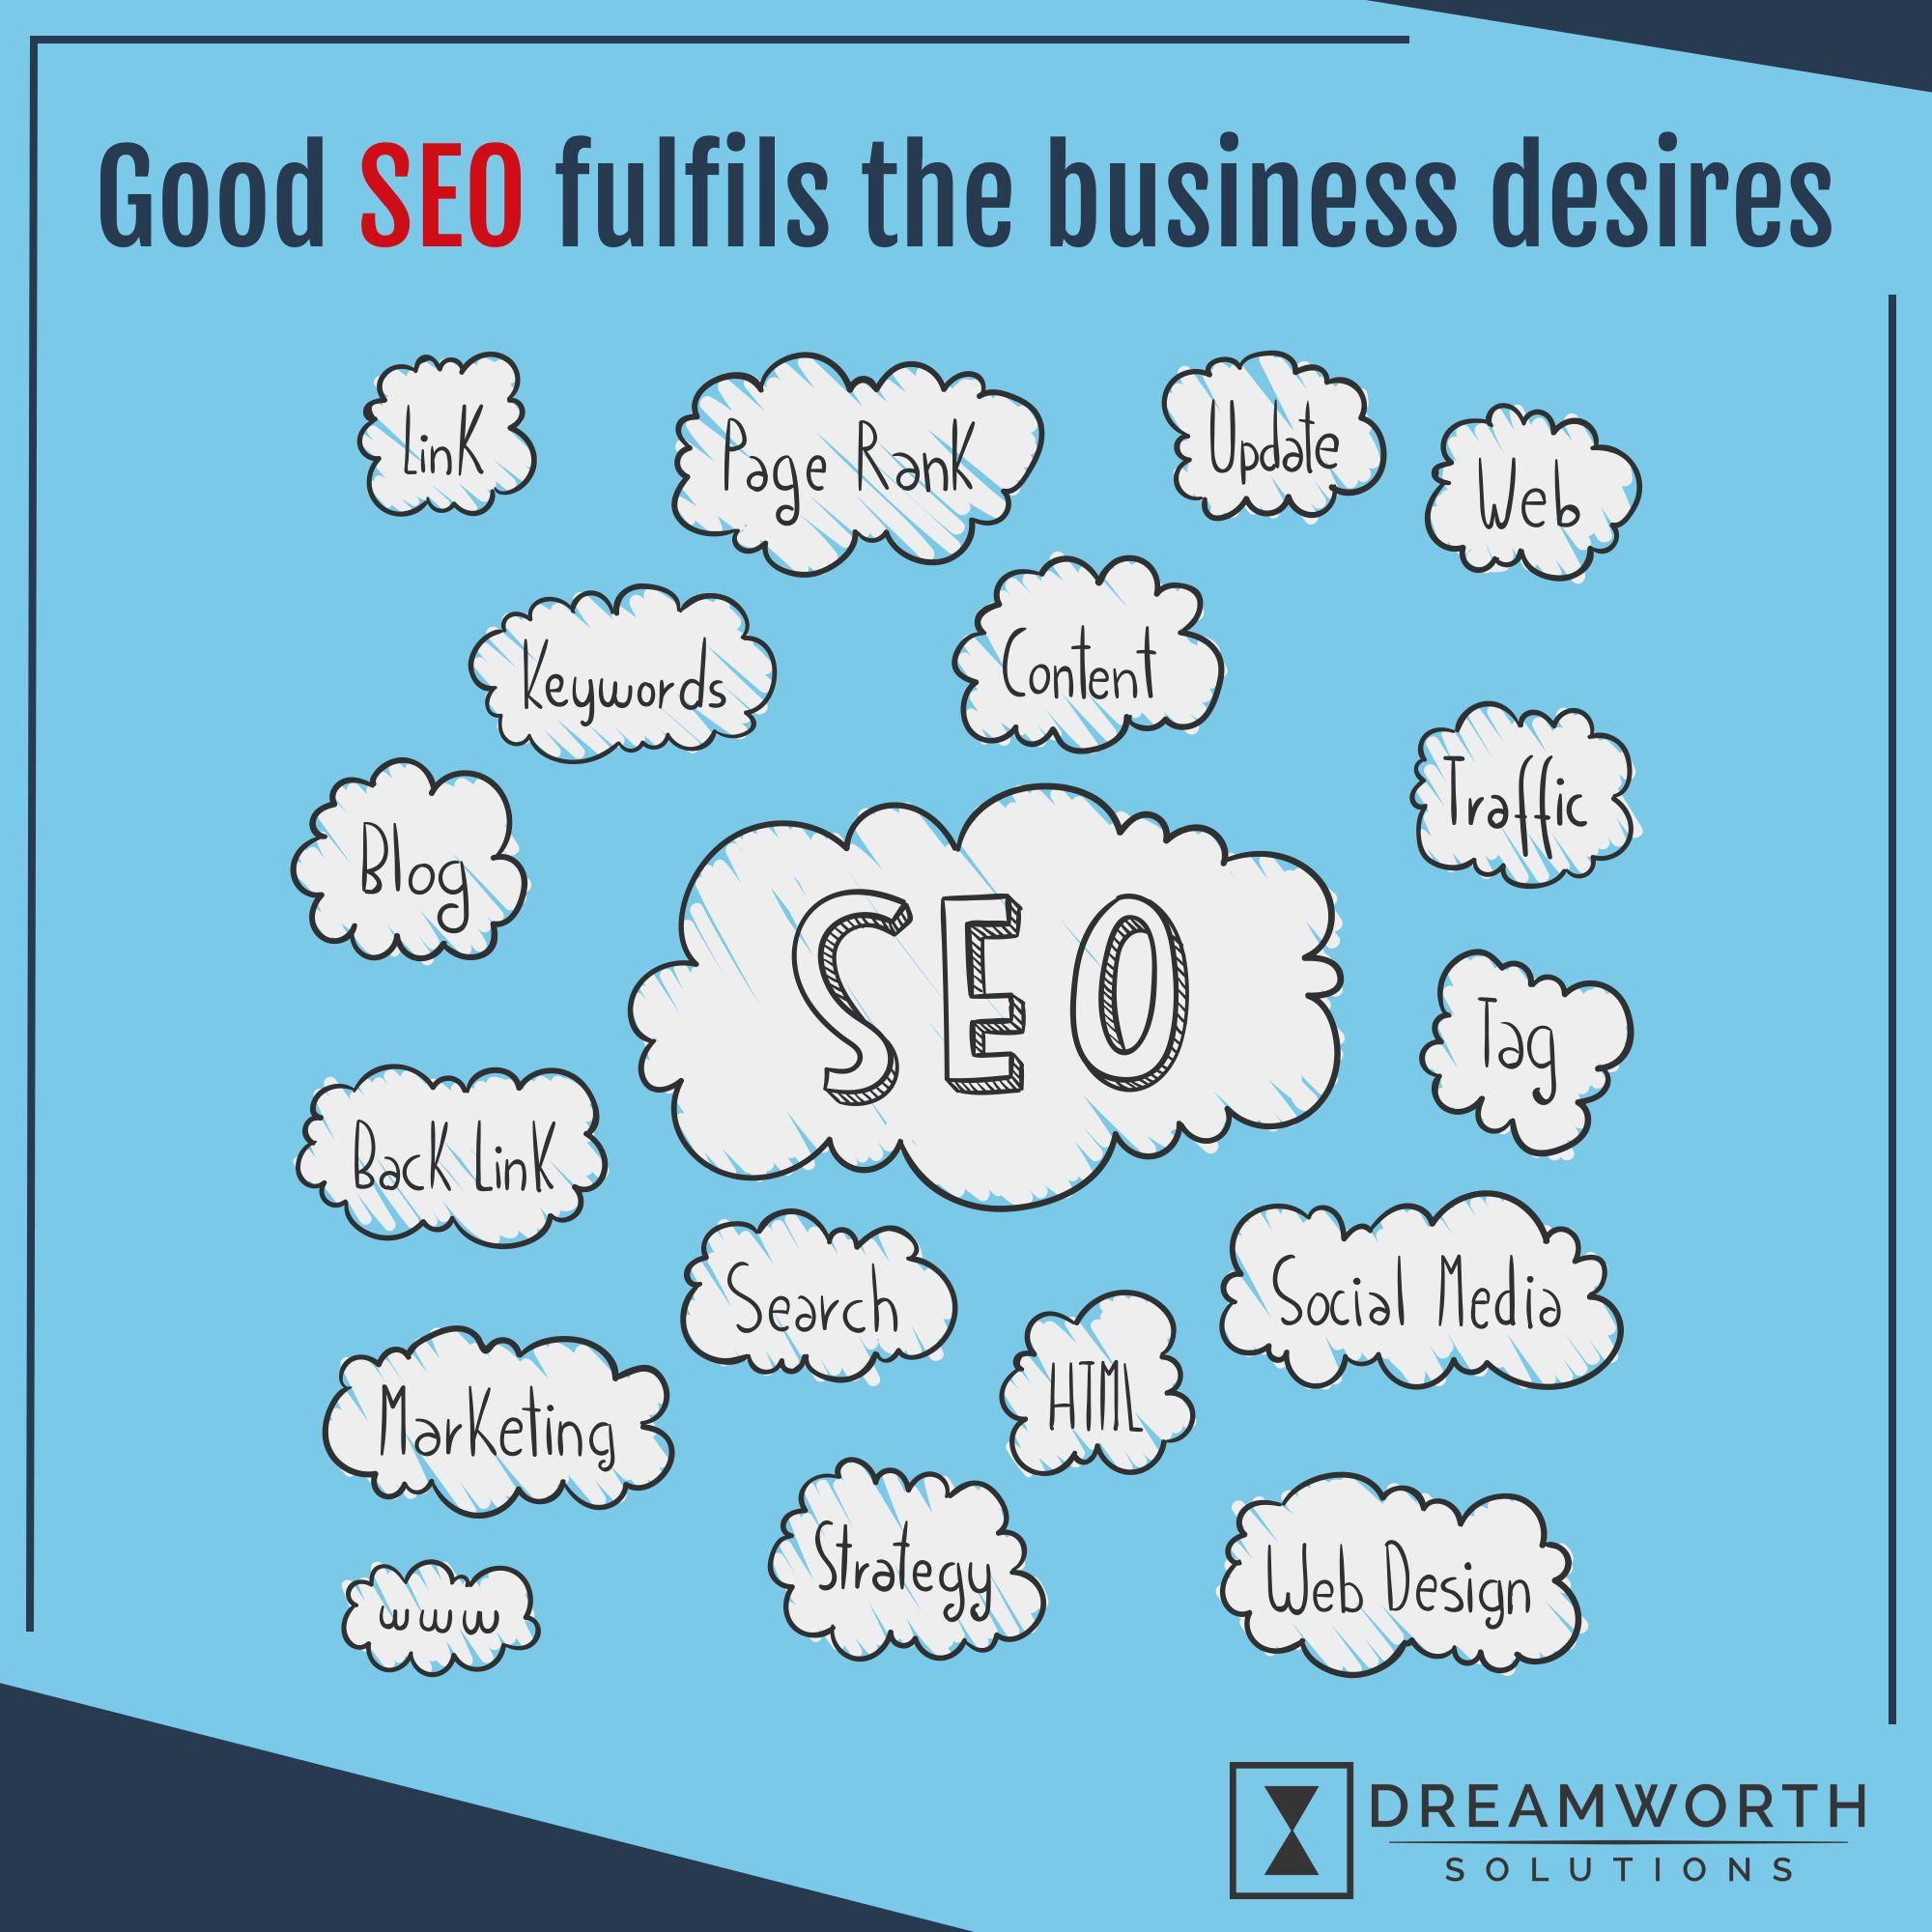 Dreamworth provide best seo services